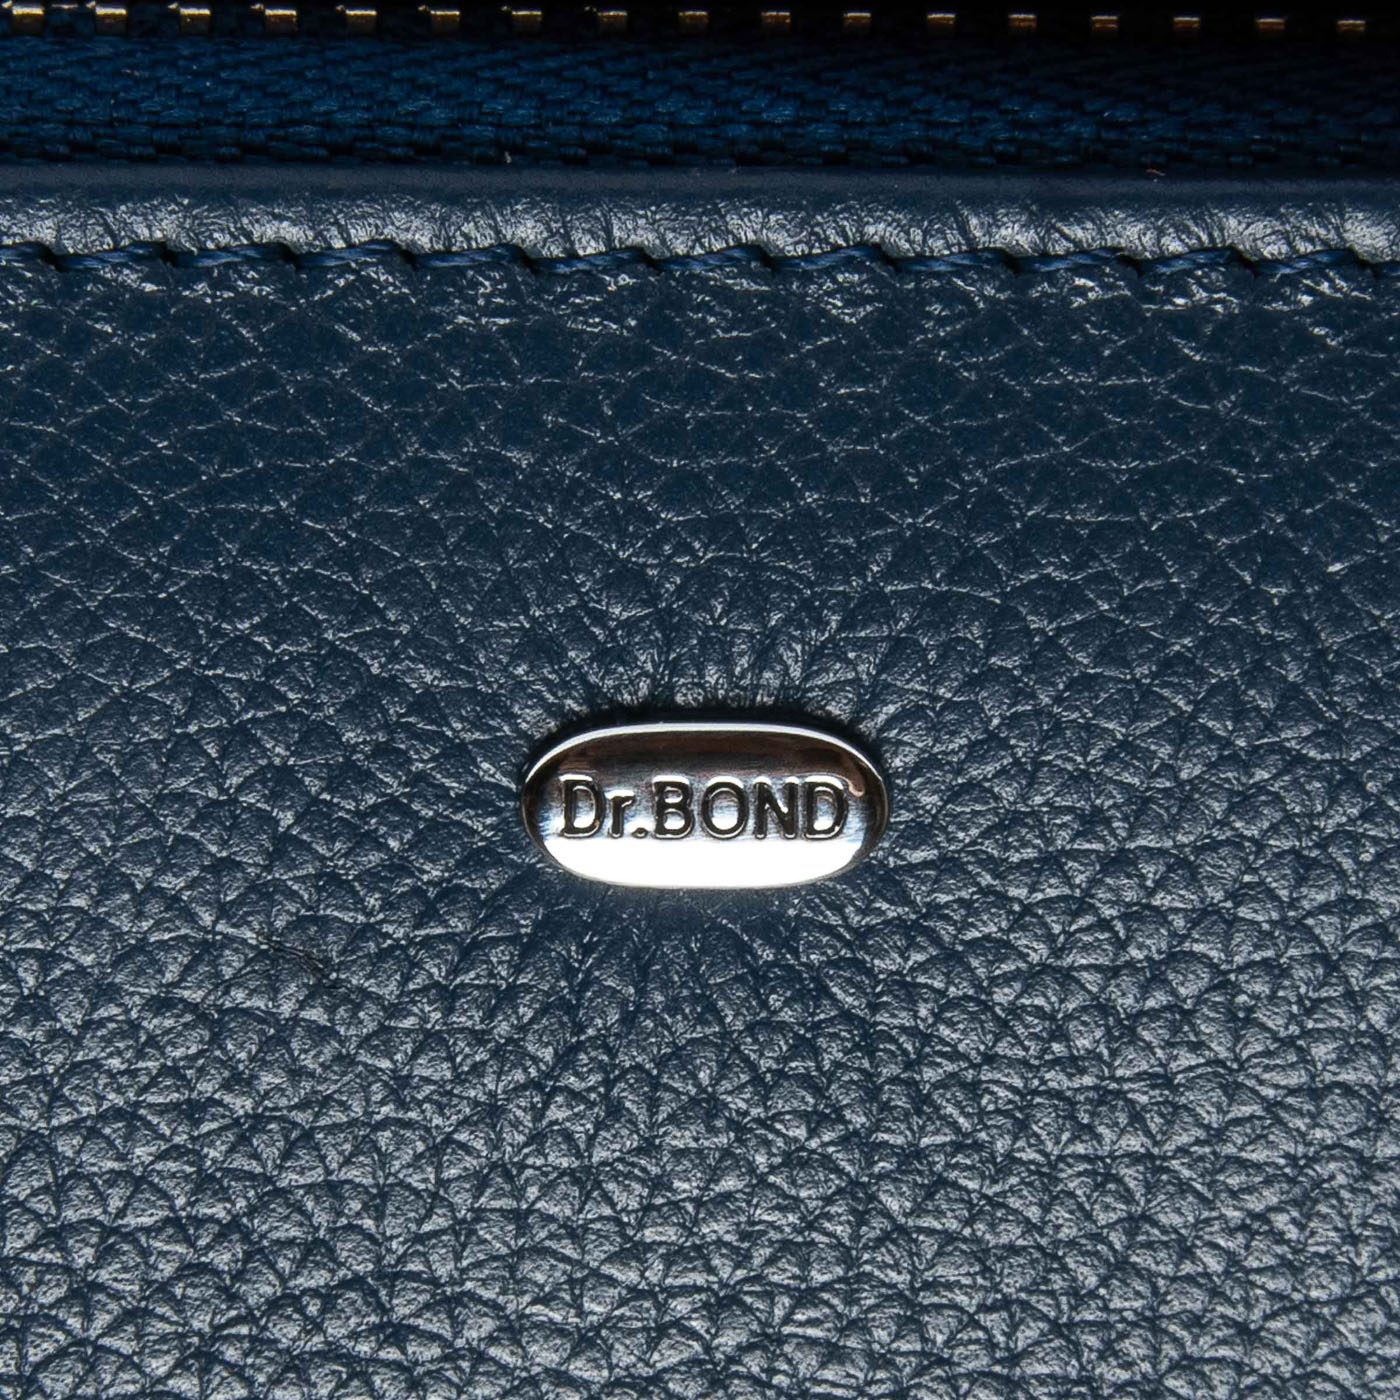 Кошелек Classic кожа DR. BOND WS-8 blue - фото 3